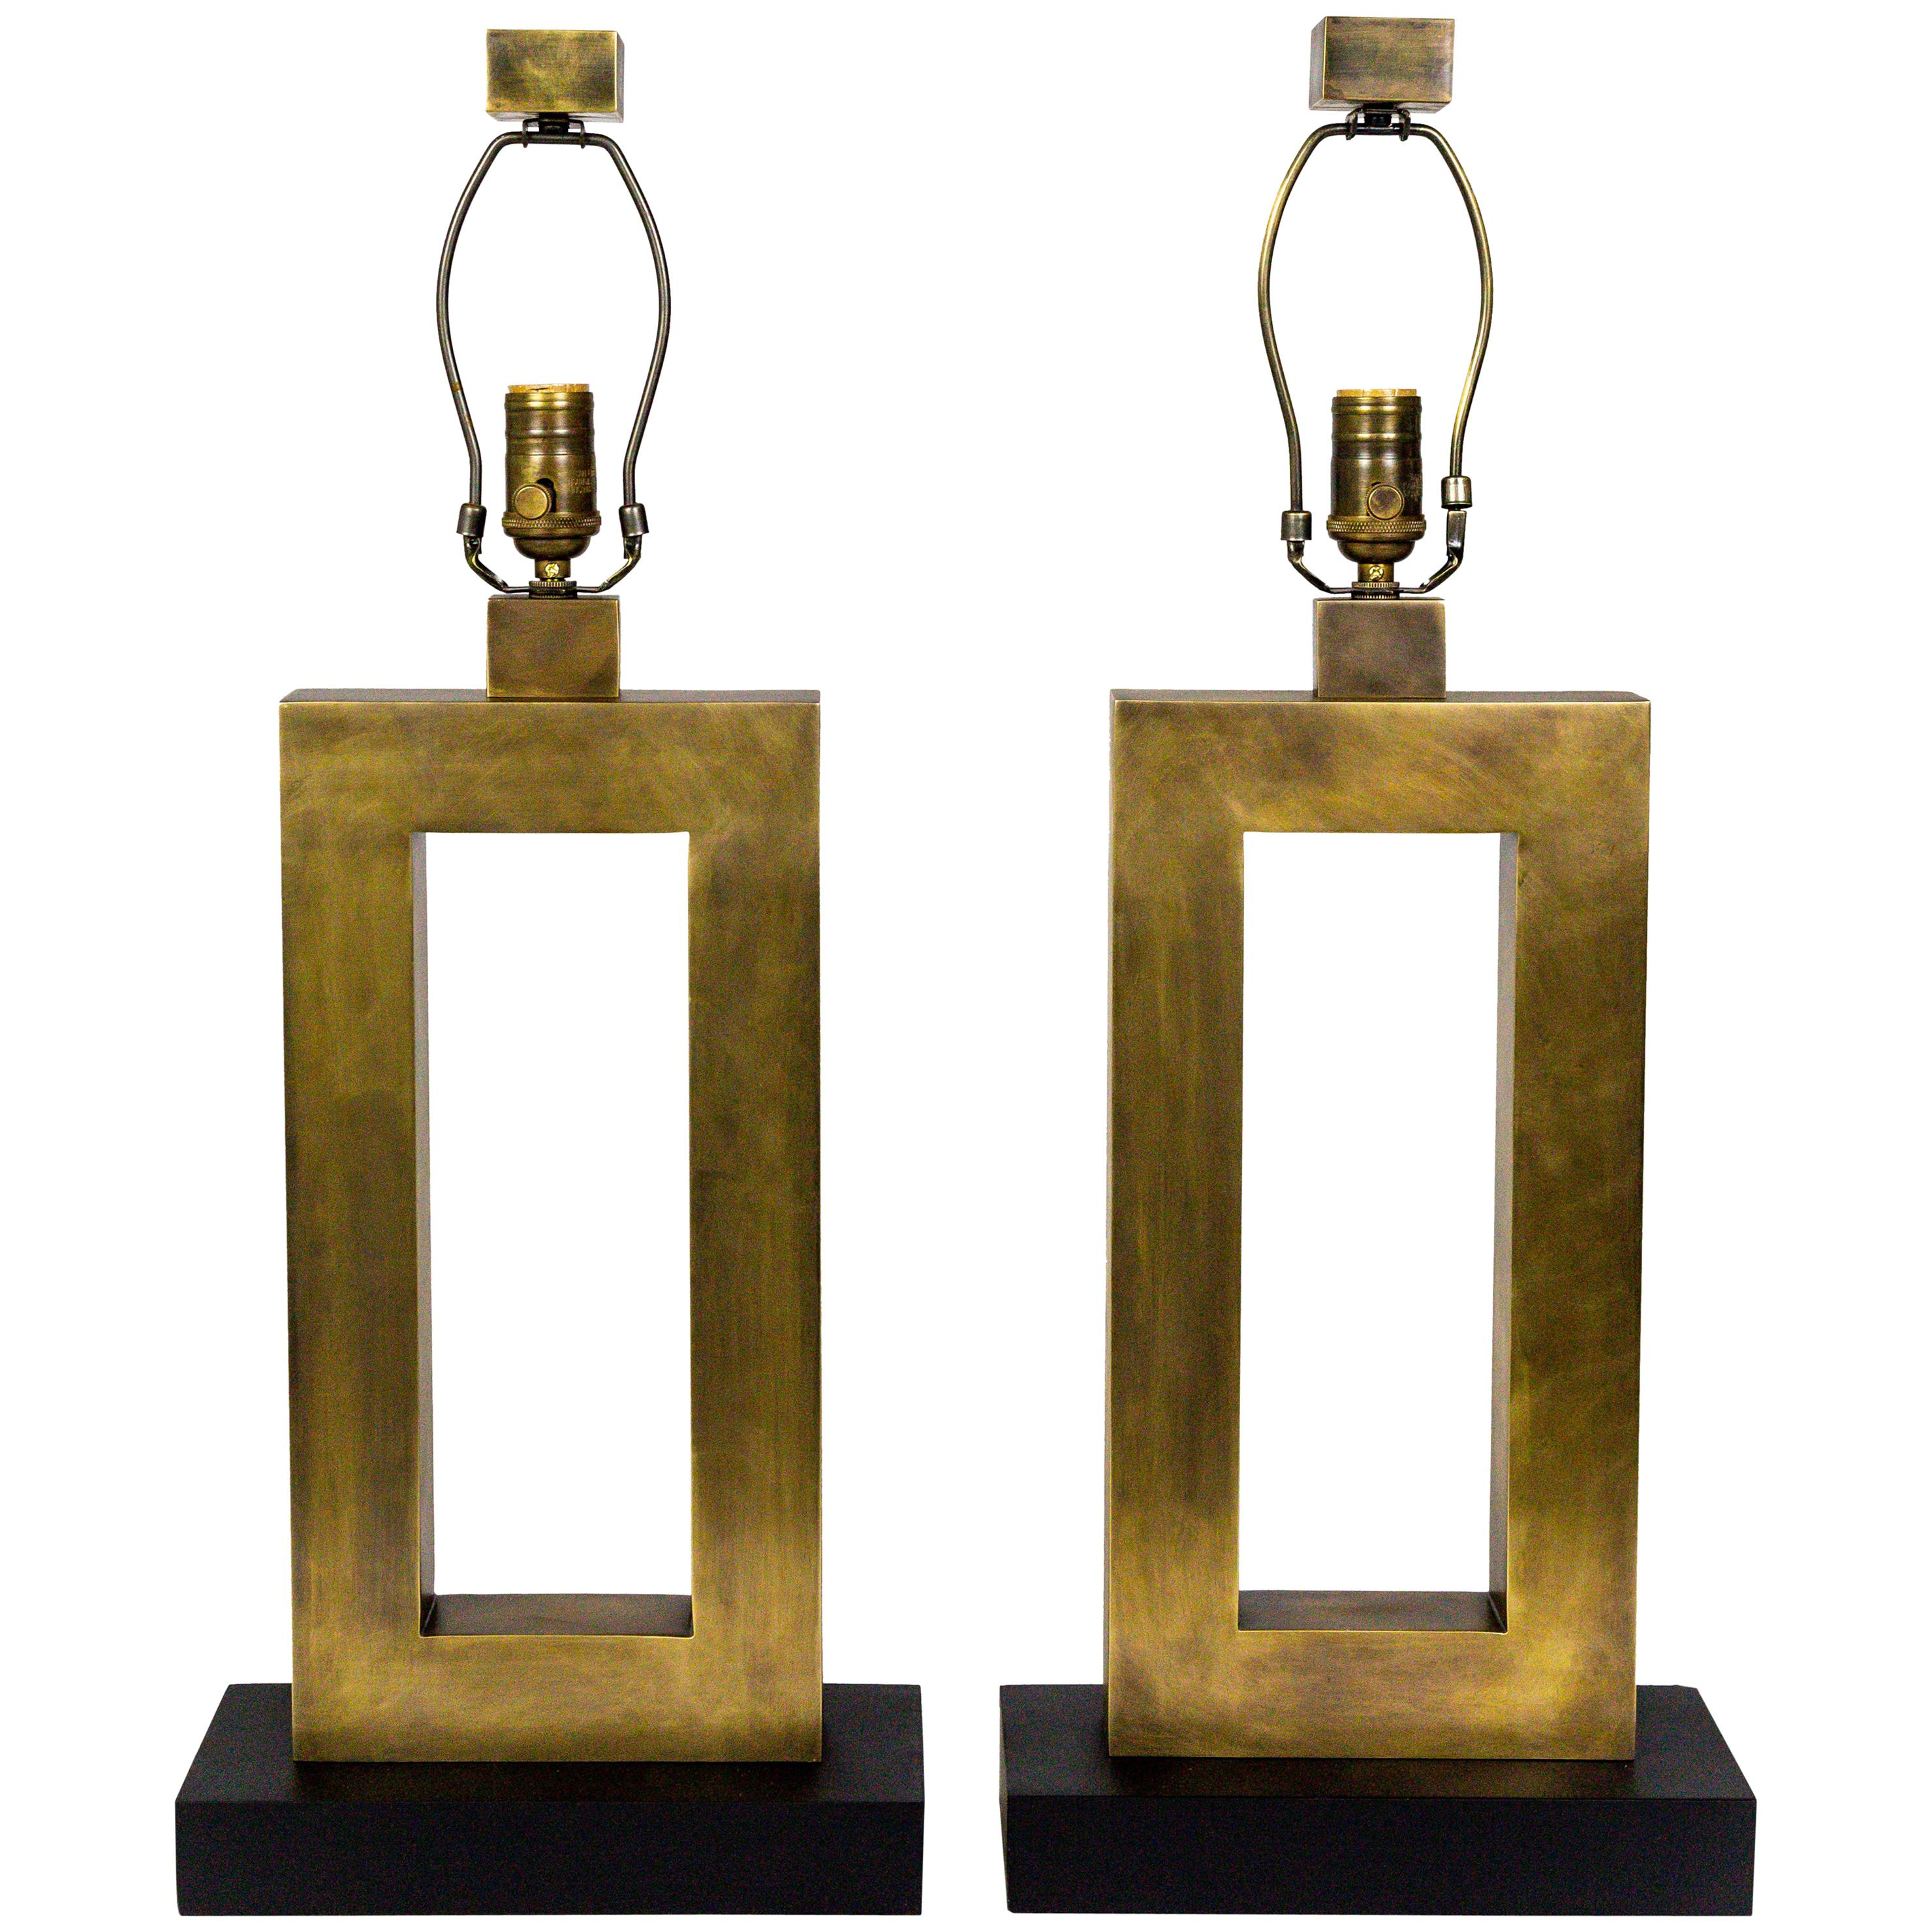 Rectangular Antiqued Brass Table Lamps, 'Pair'